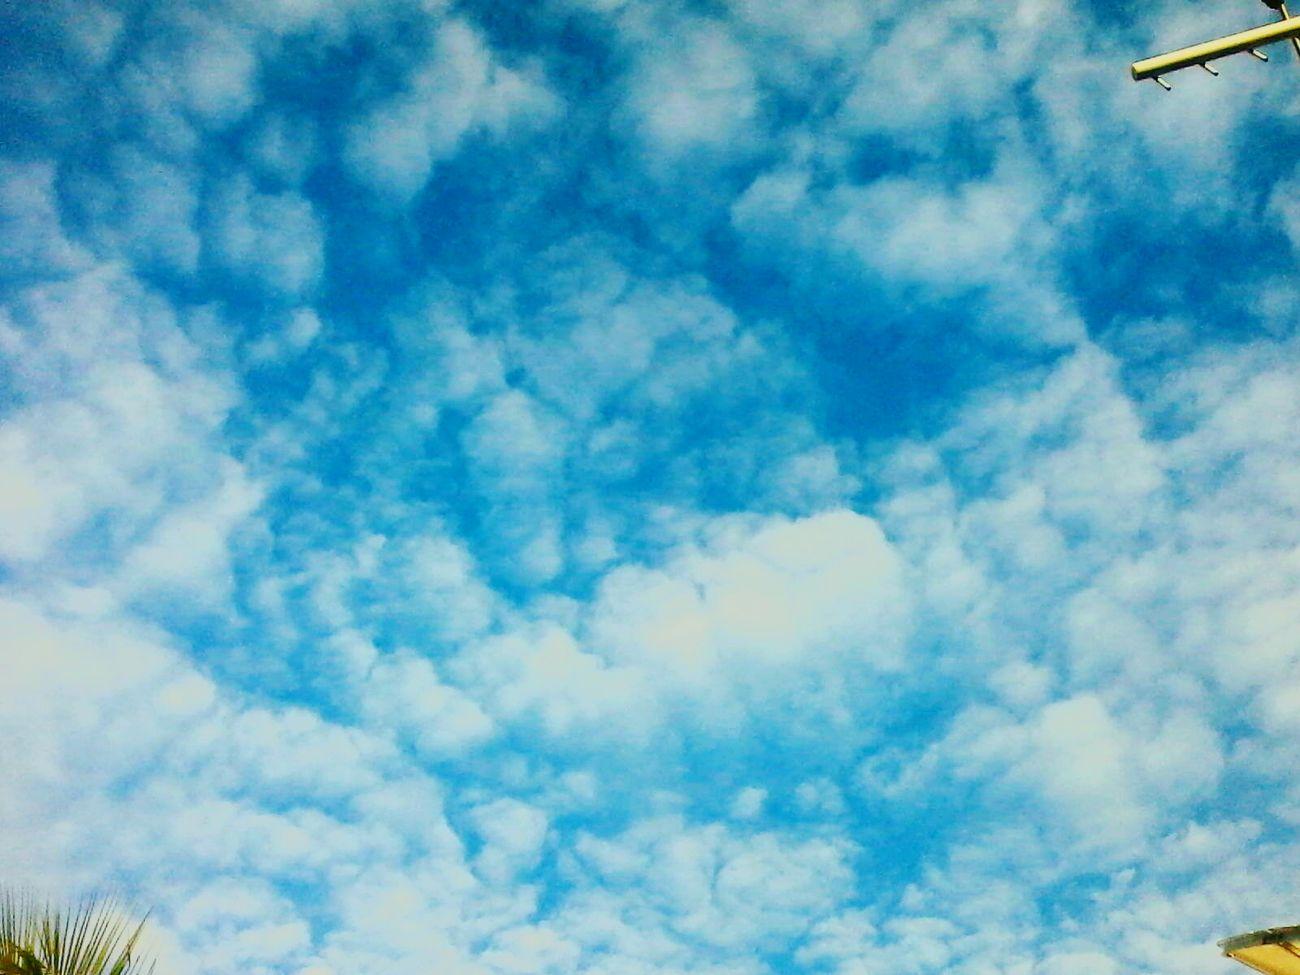 Sky ♡ Sky Collection Ceudays Ceu Liindo! Skyline CeuAzul Sky And Trees Skyscrapers Ceumaravilhoso CeuPerfeito Skylovers